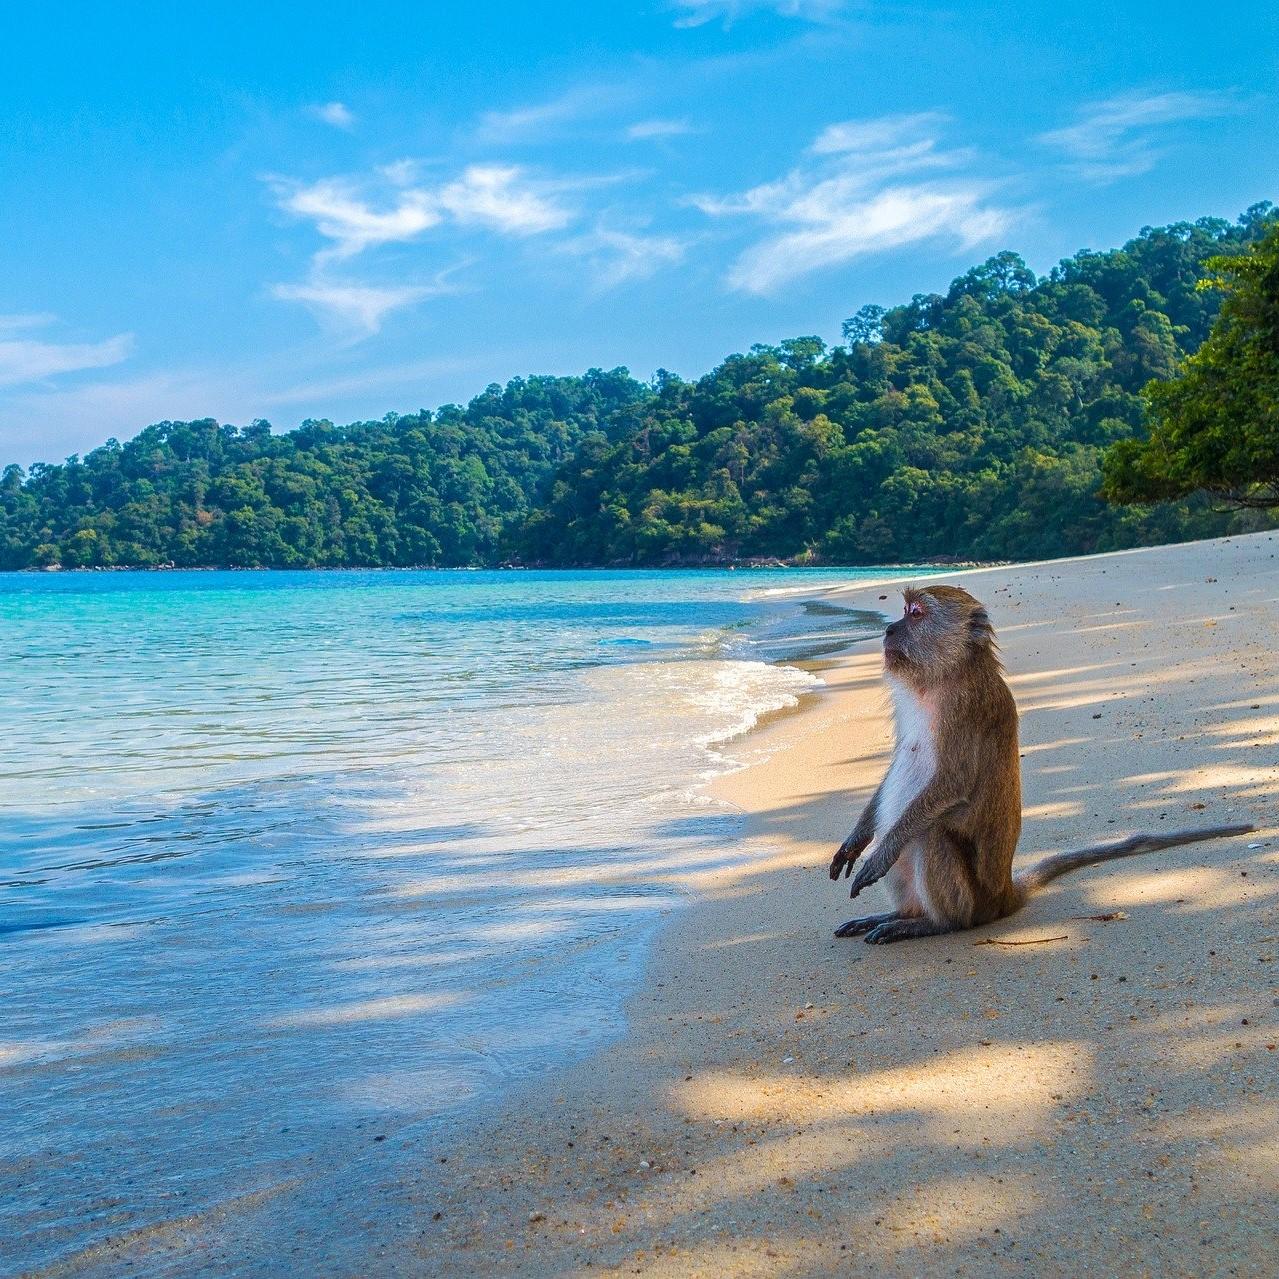 https://www.hladinaalfa.cz/wp-content/uploads/2020/04/thailand-monkey_s.jpg